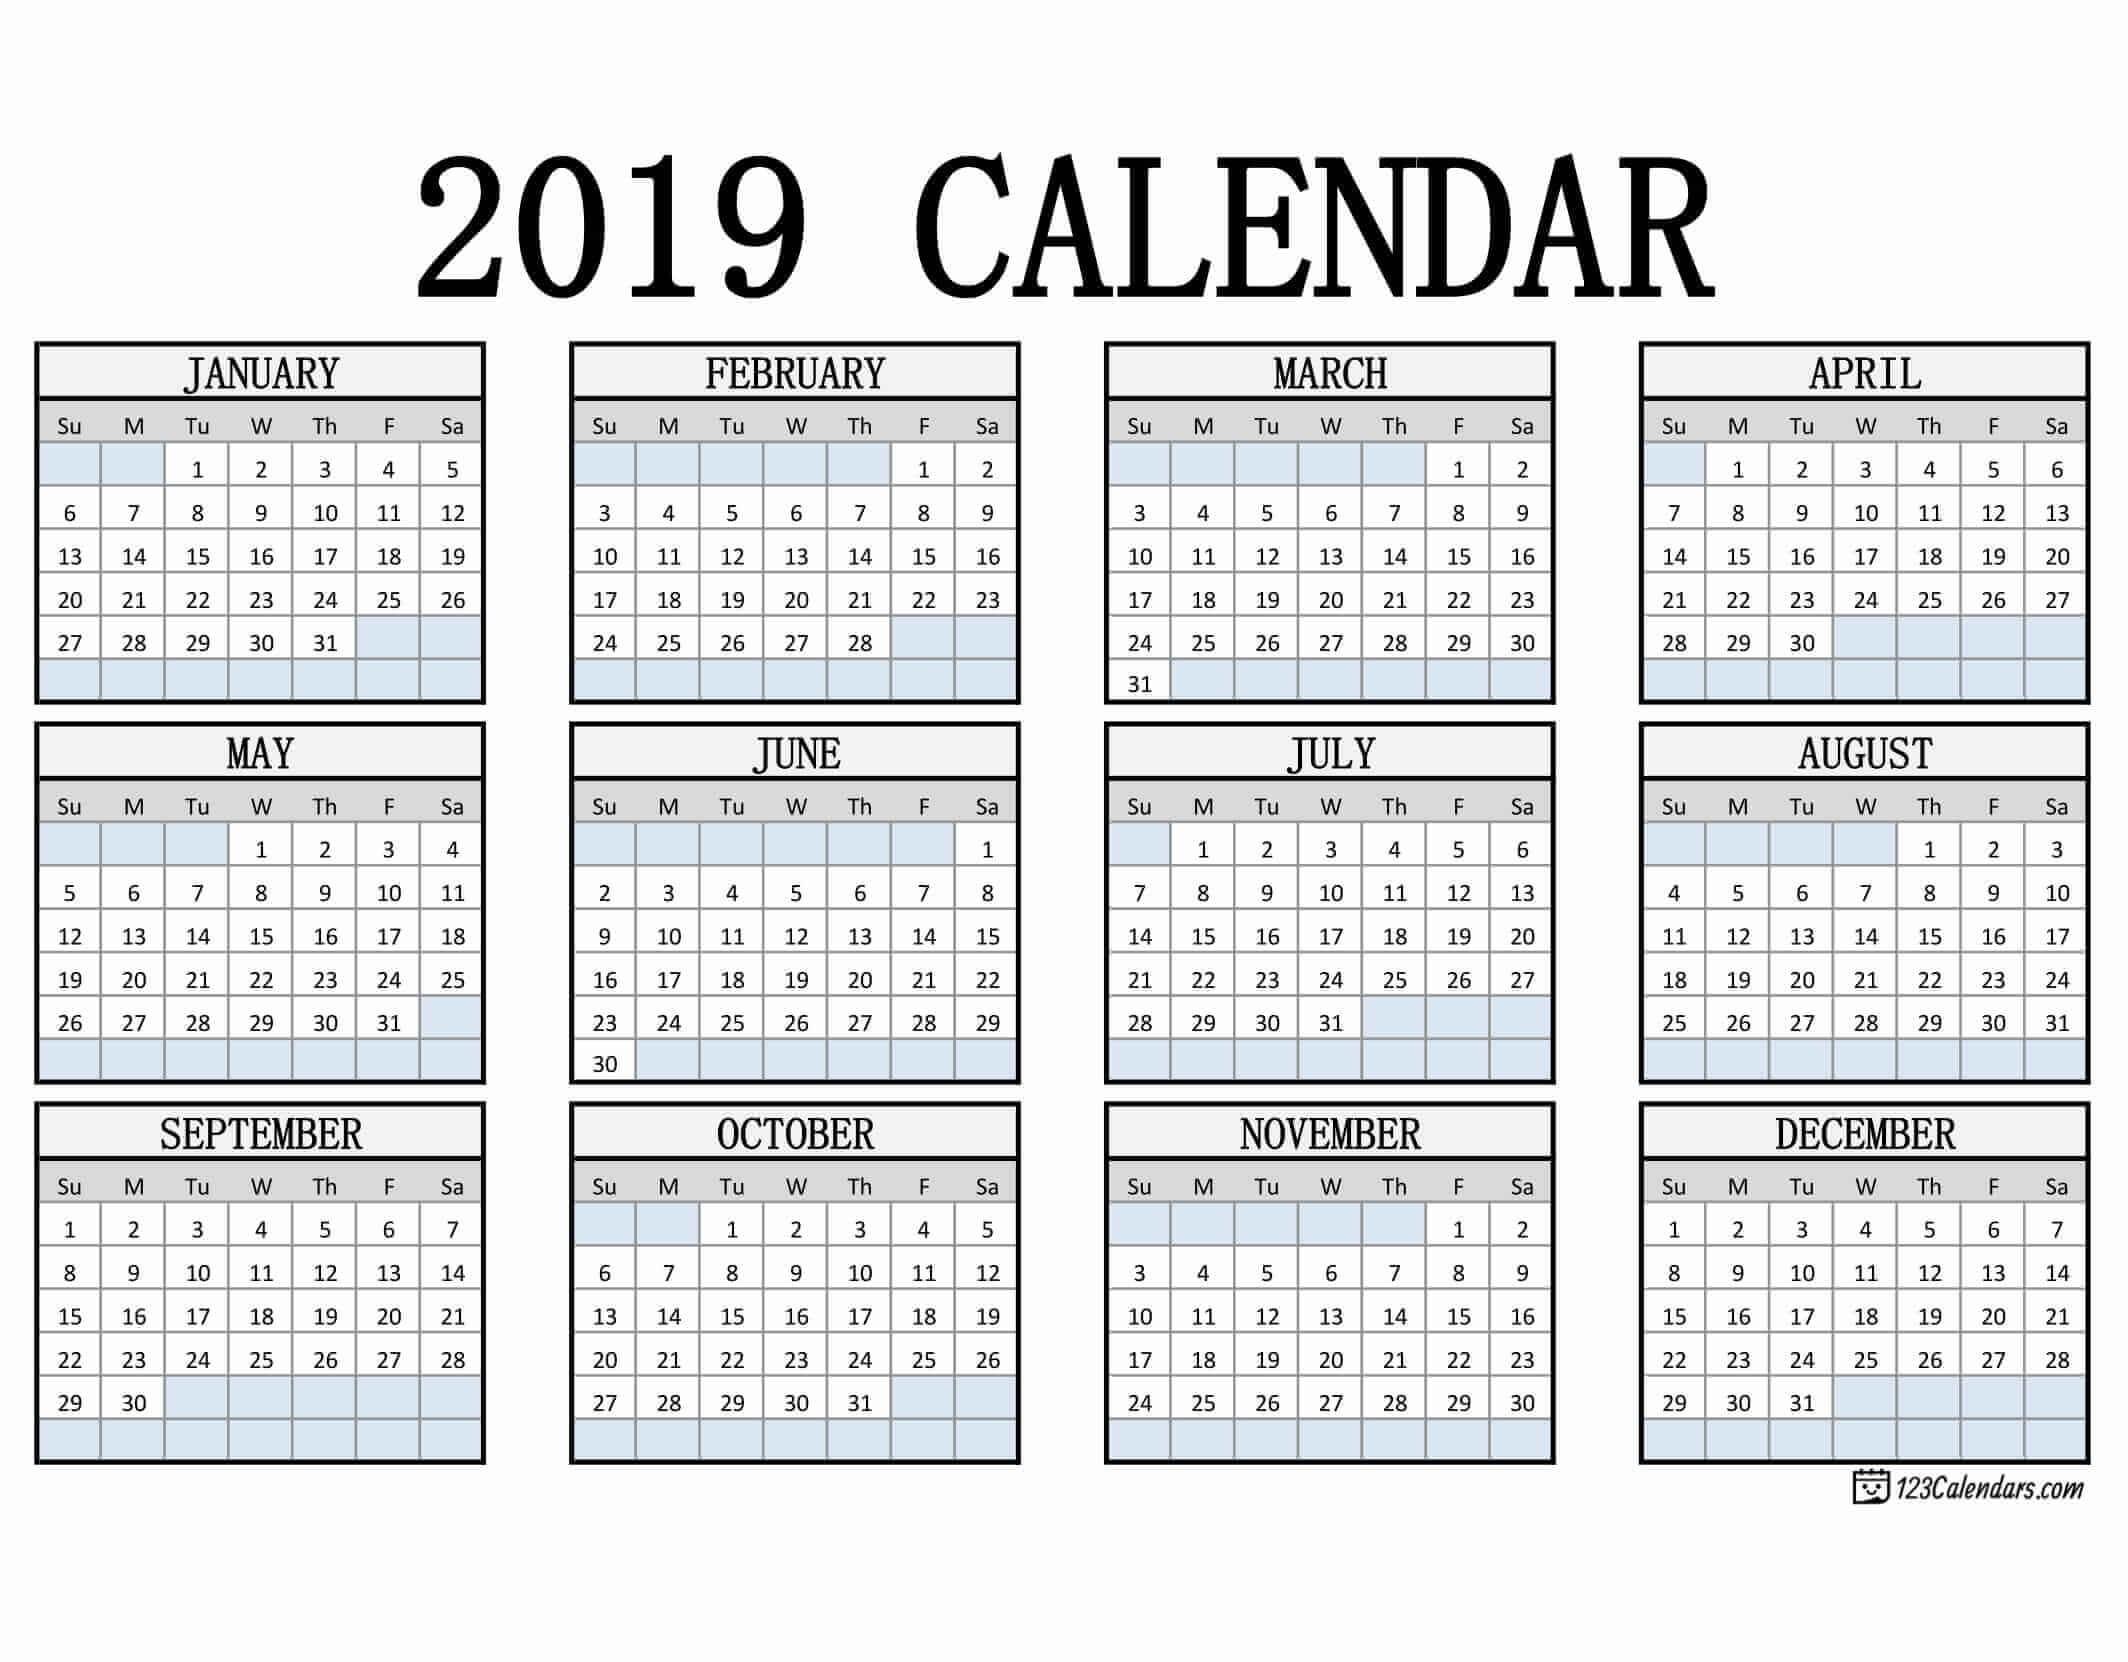 Printable Calendar 2019 Template 2019 Printable Calendar 123calendars